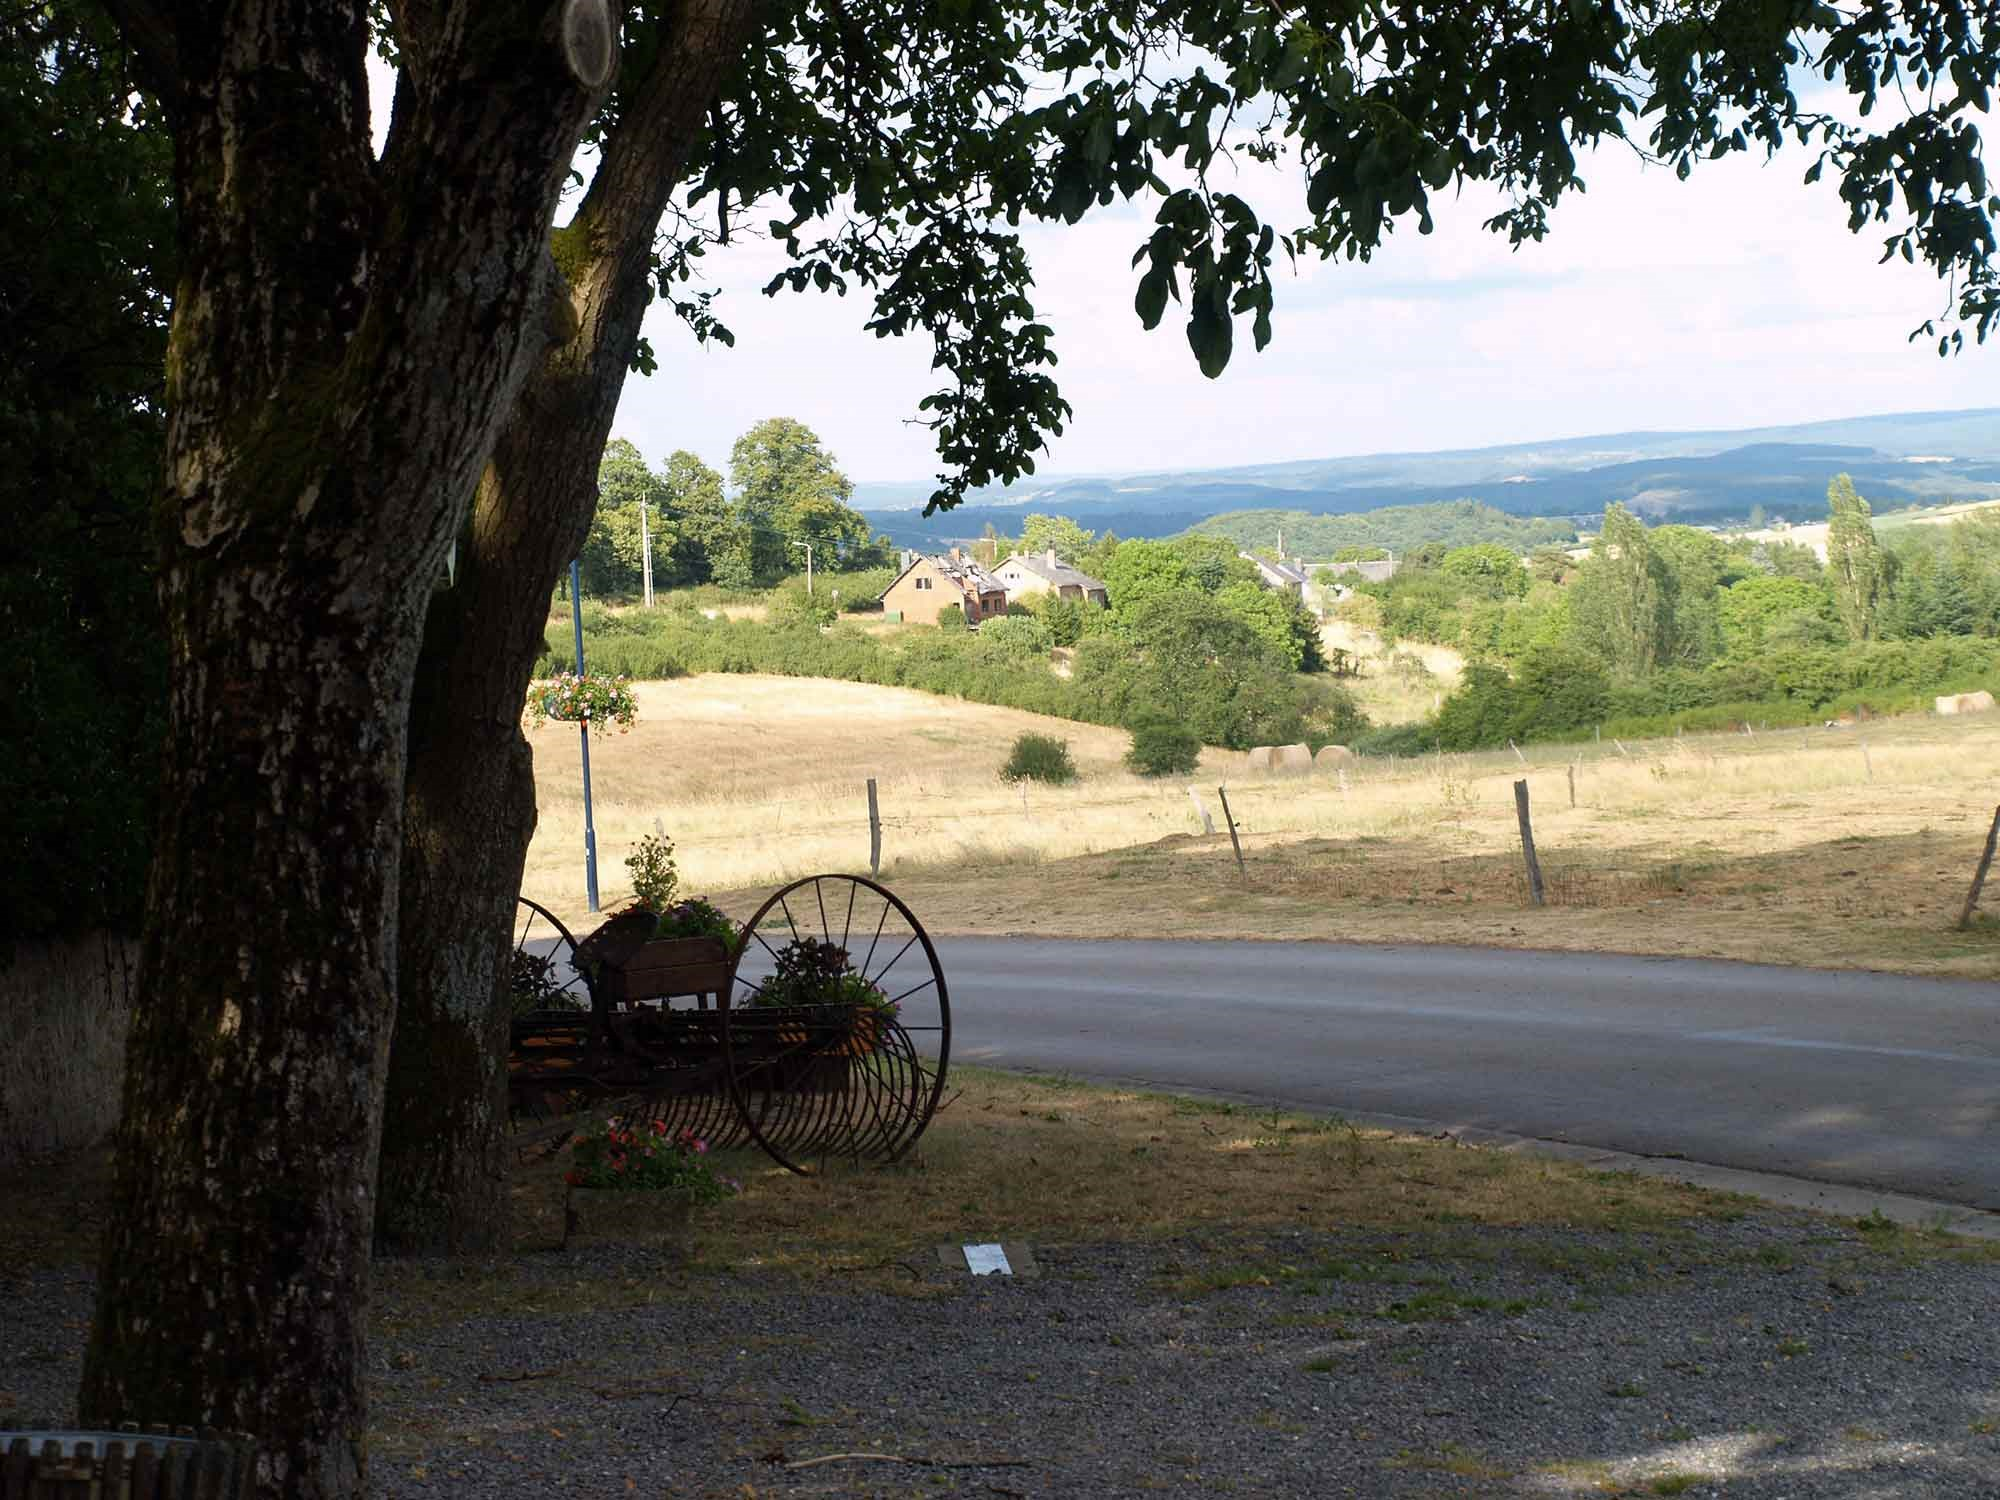 ardenne residences beauraing 5580 region landscape 6920 Sohier nature